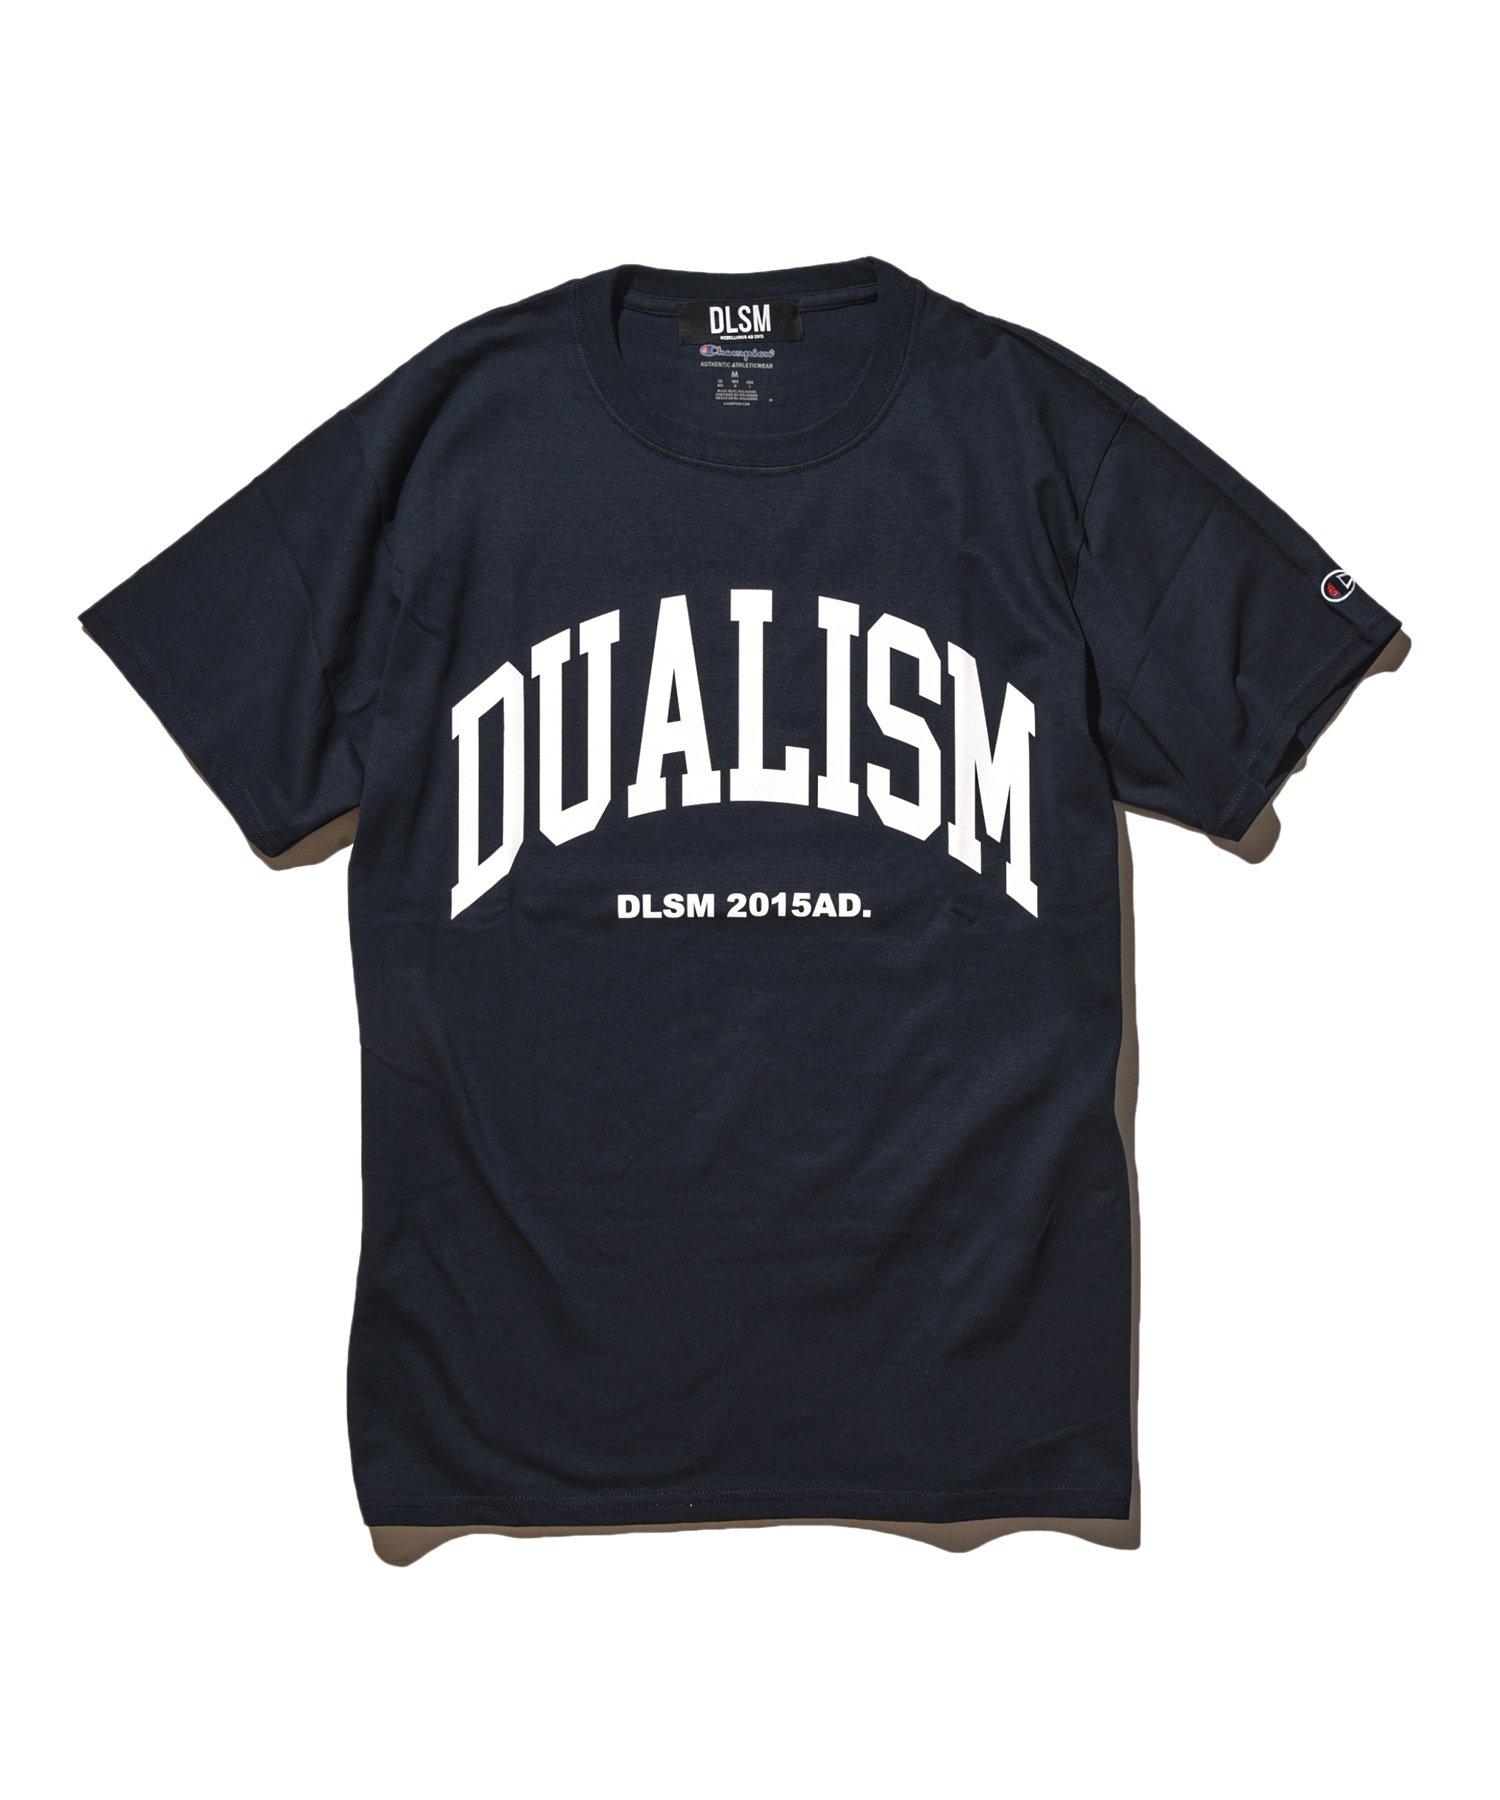 DUALISM UV ARCH LOGO TEE